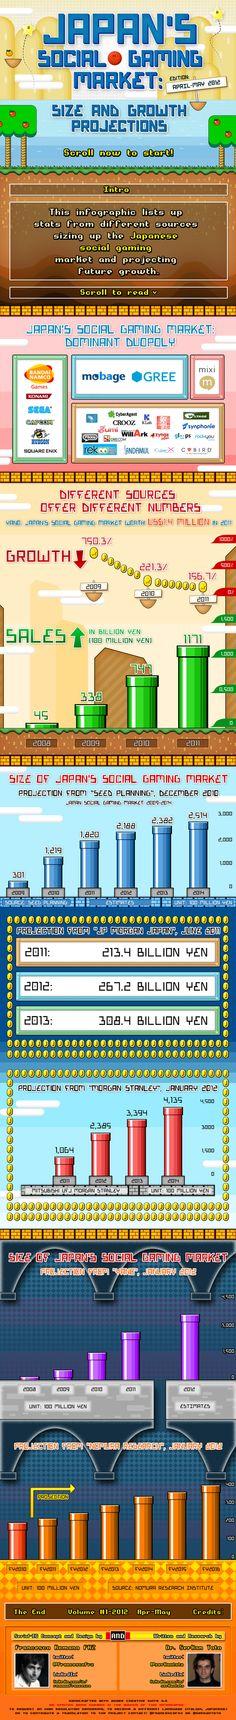 Japan's Social Games Market